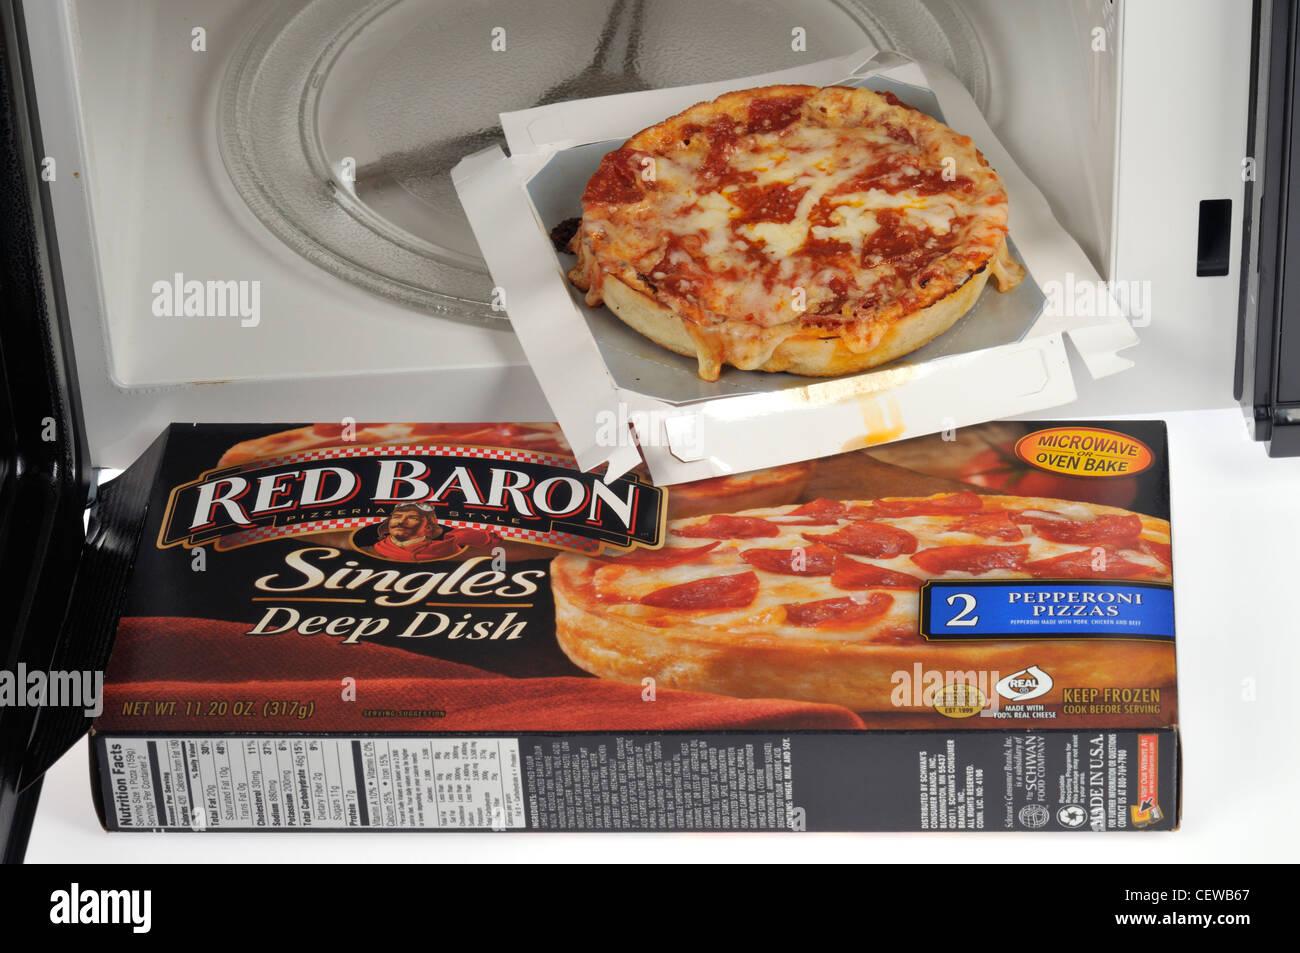 Frozen Pizza Box Food Stock Photos Frozen Pizza Box Food